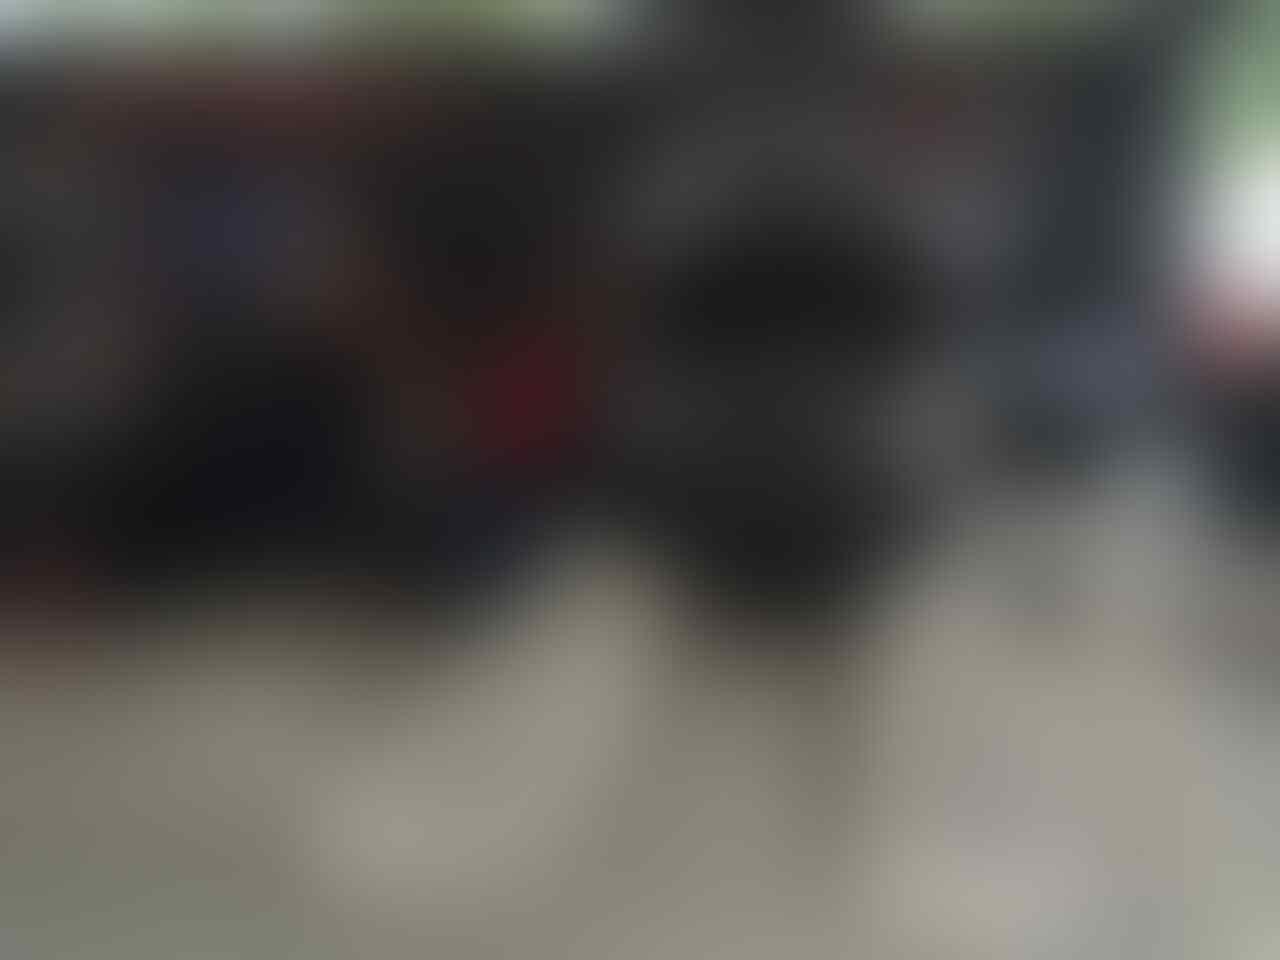 [FR] BlackAuto Battle Tanggal 17 Desember 2016 Surabaya: This is a Heaven Automotive